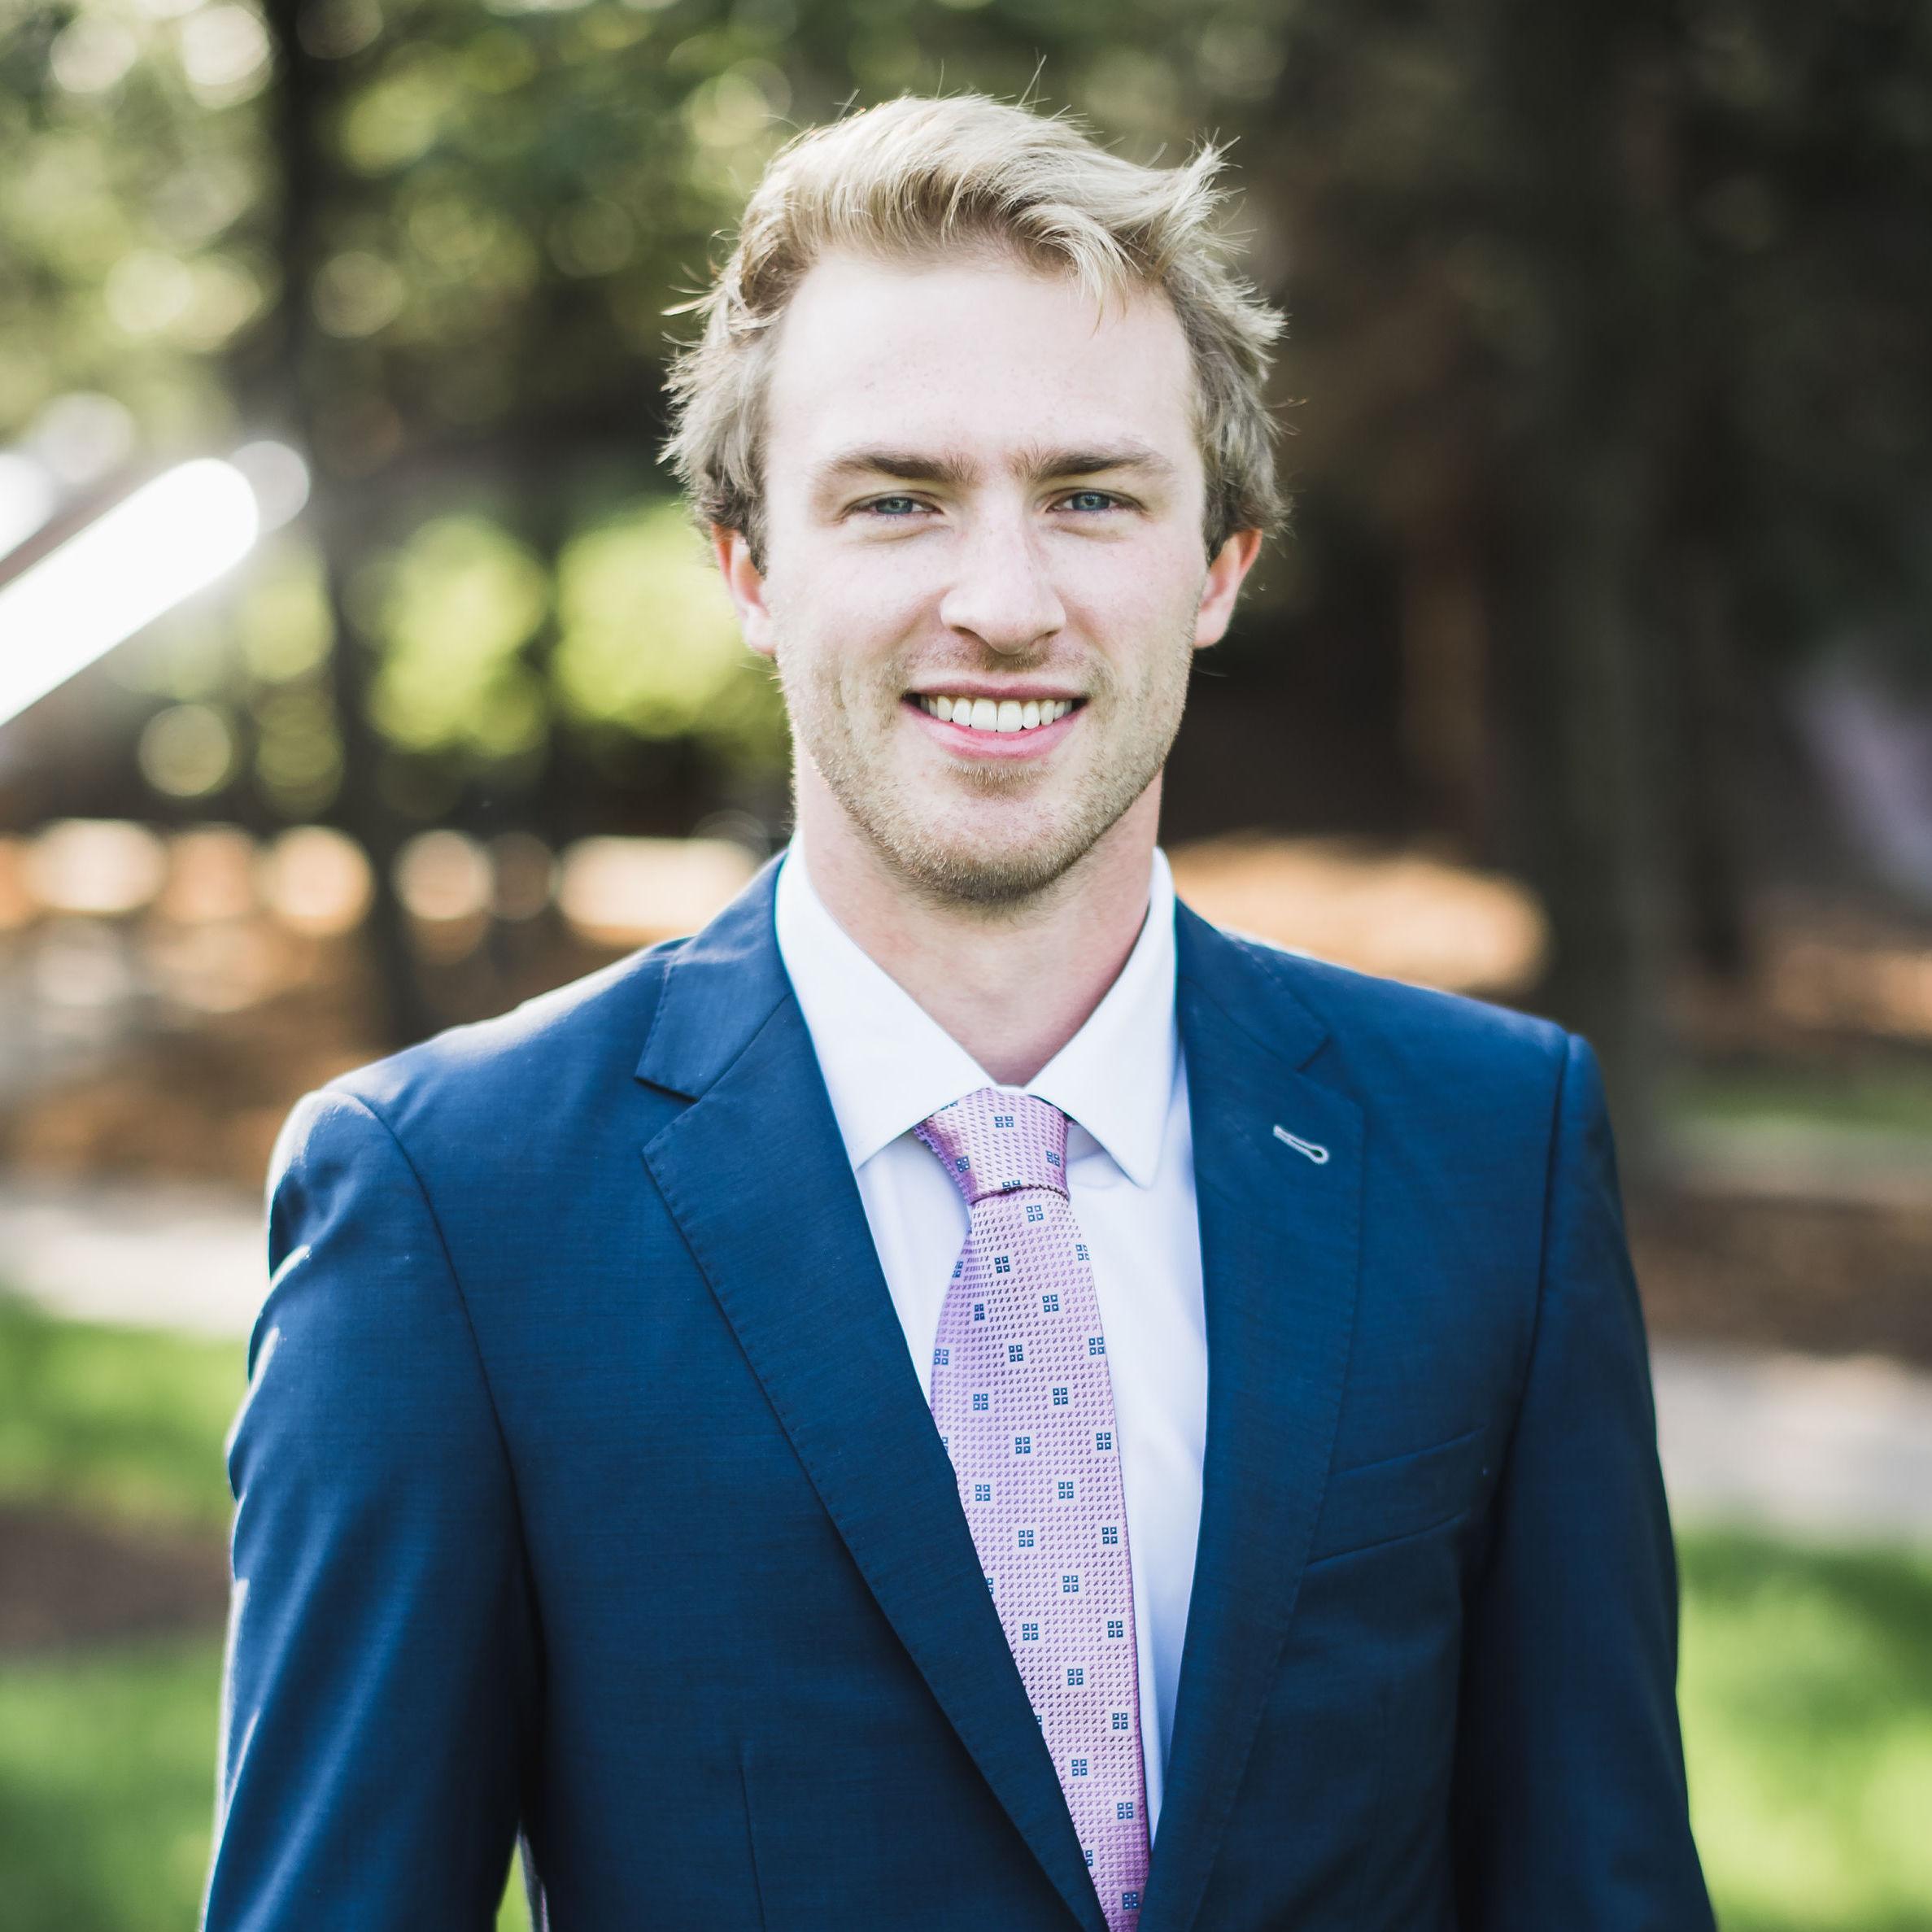 Dan Molenaar is the Business Support Specialist at Great Waters Financial.